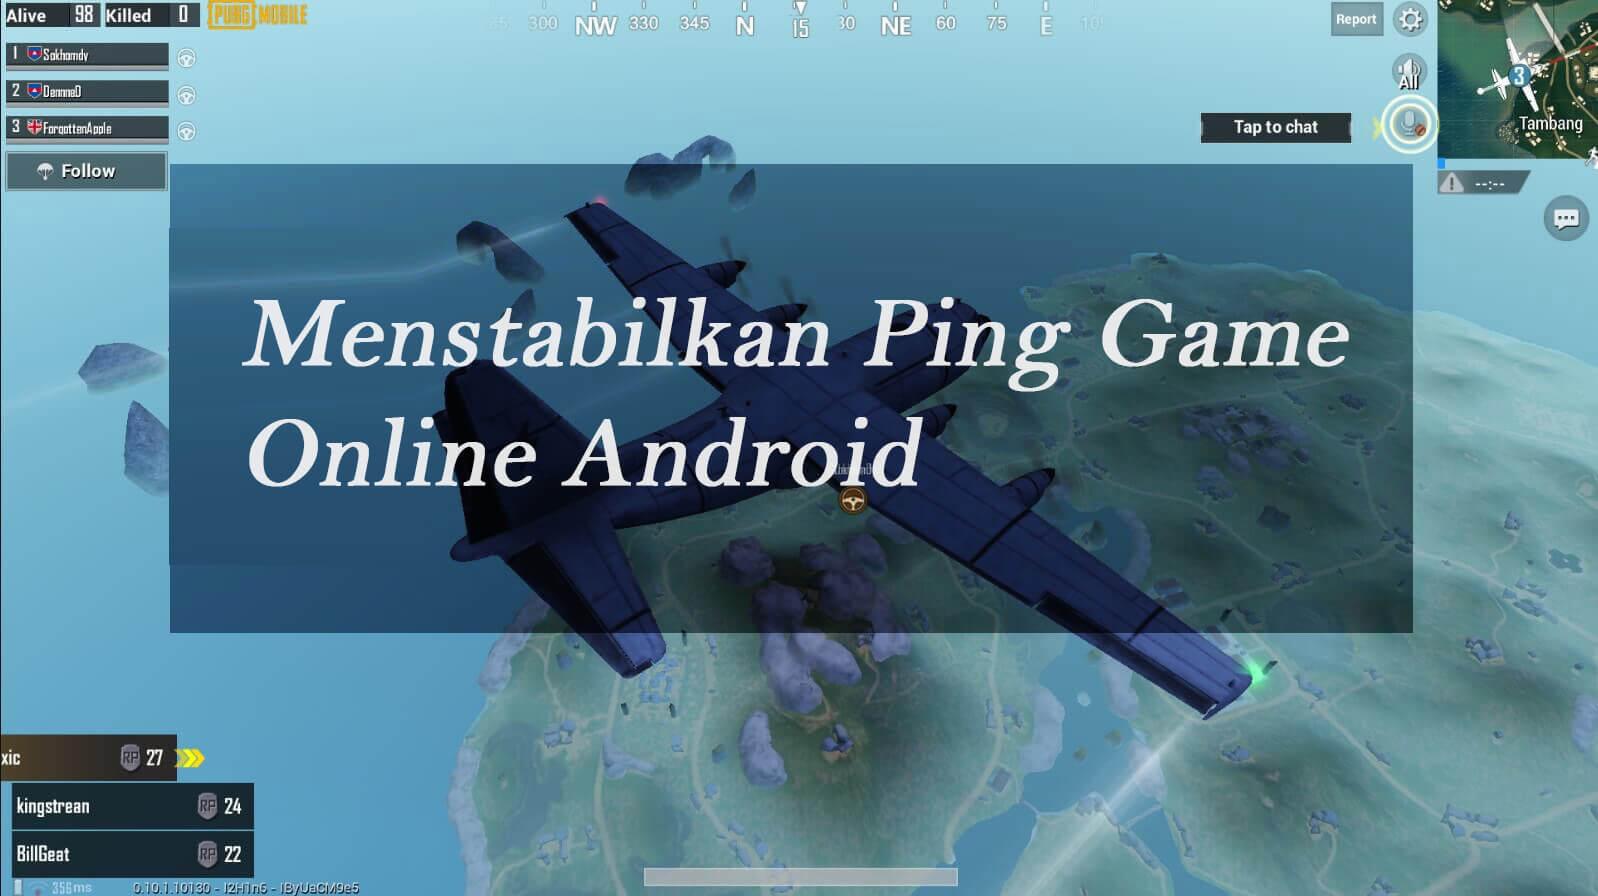 Menstabilkan Ping Game Android